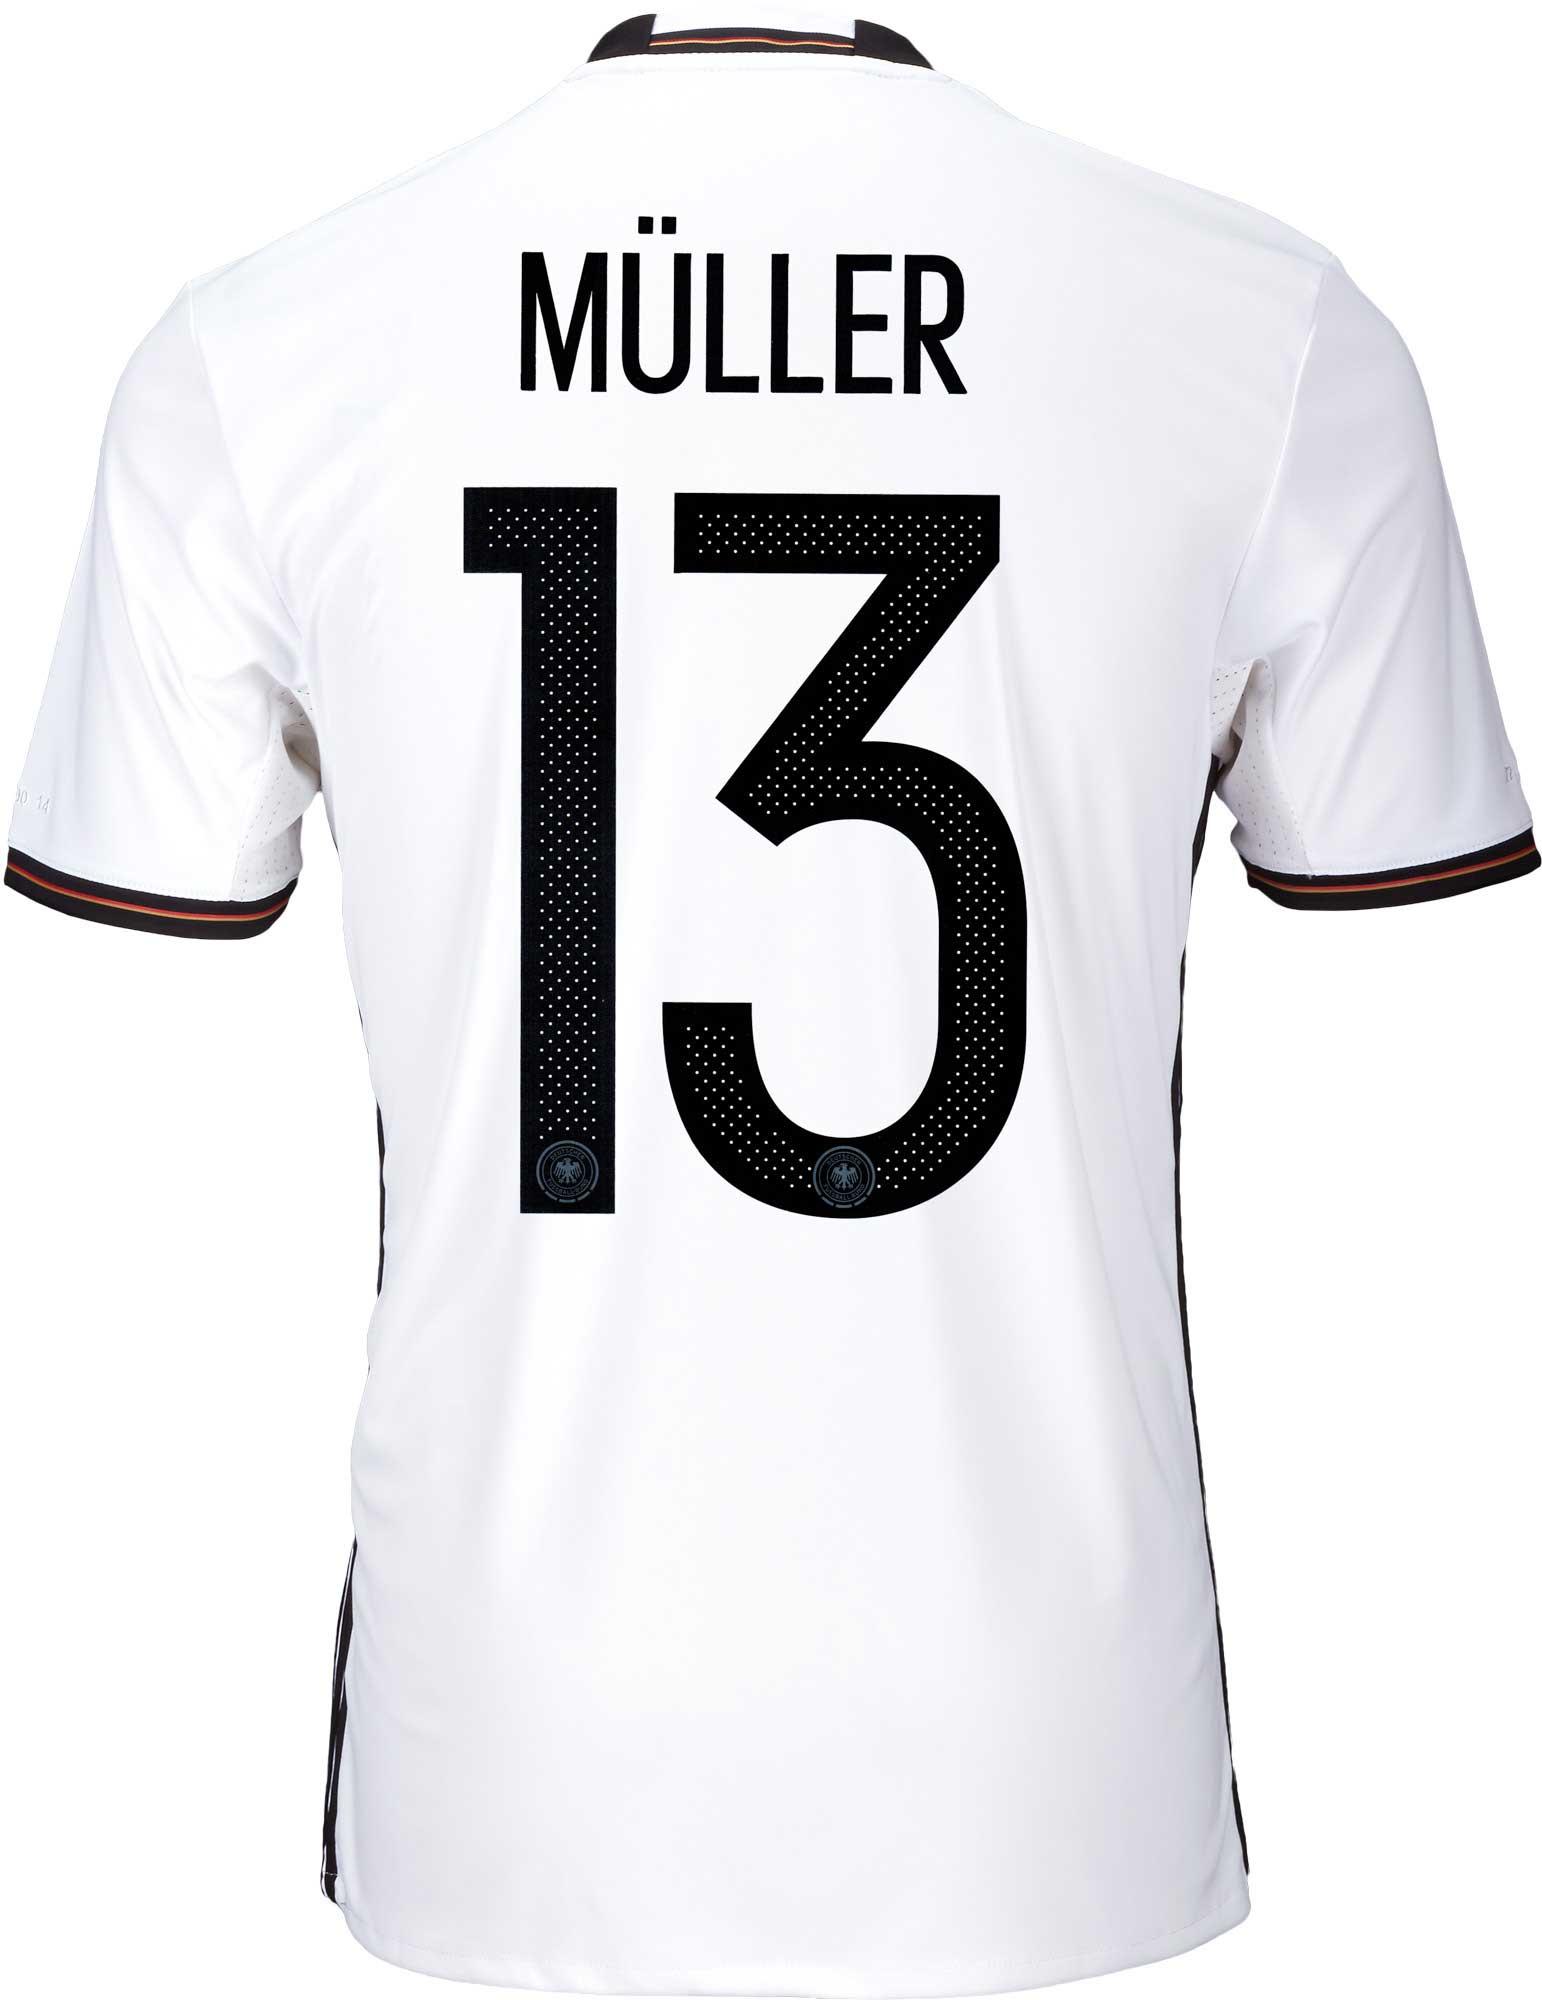 adidas Kids Muller Germany Home Jersey - 2016 Germany Jerseys 870512e53